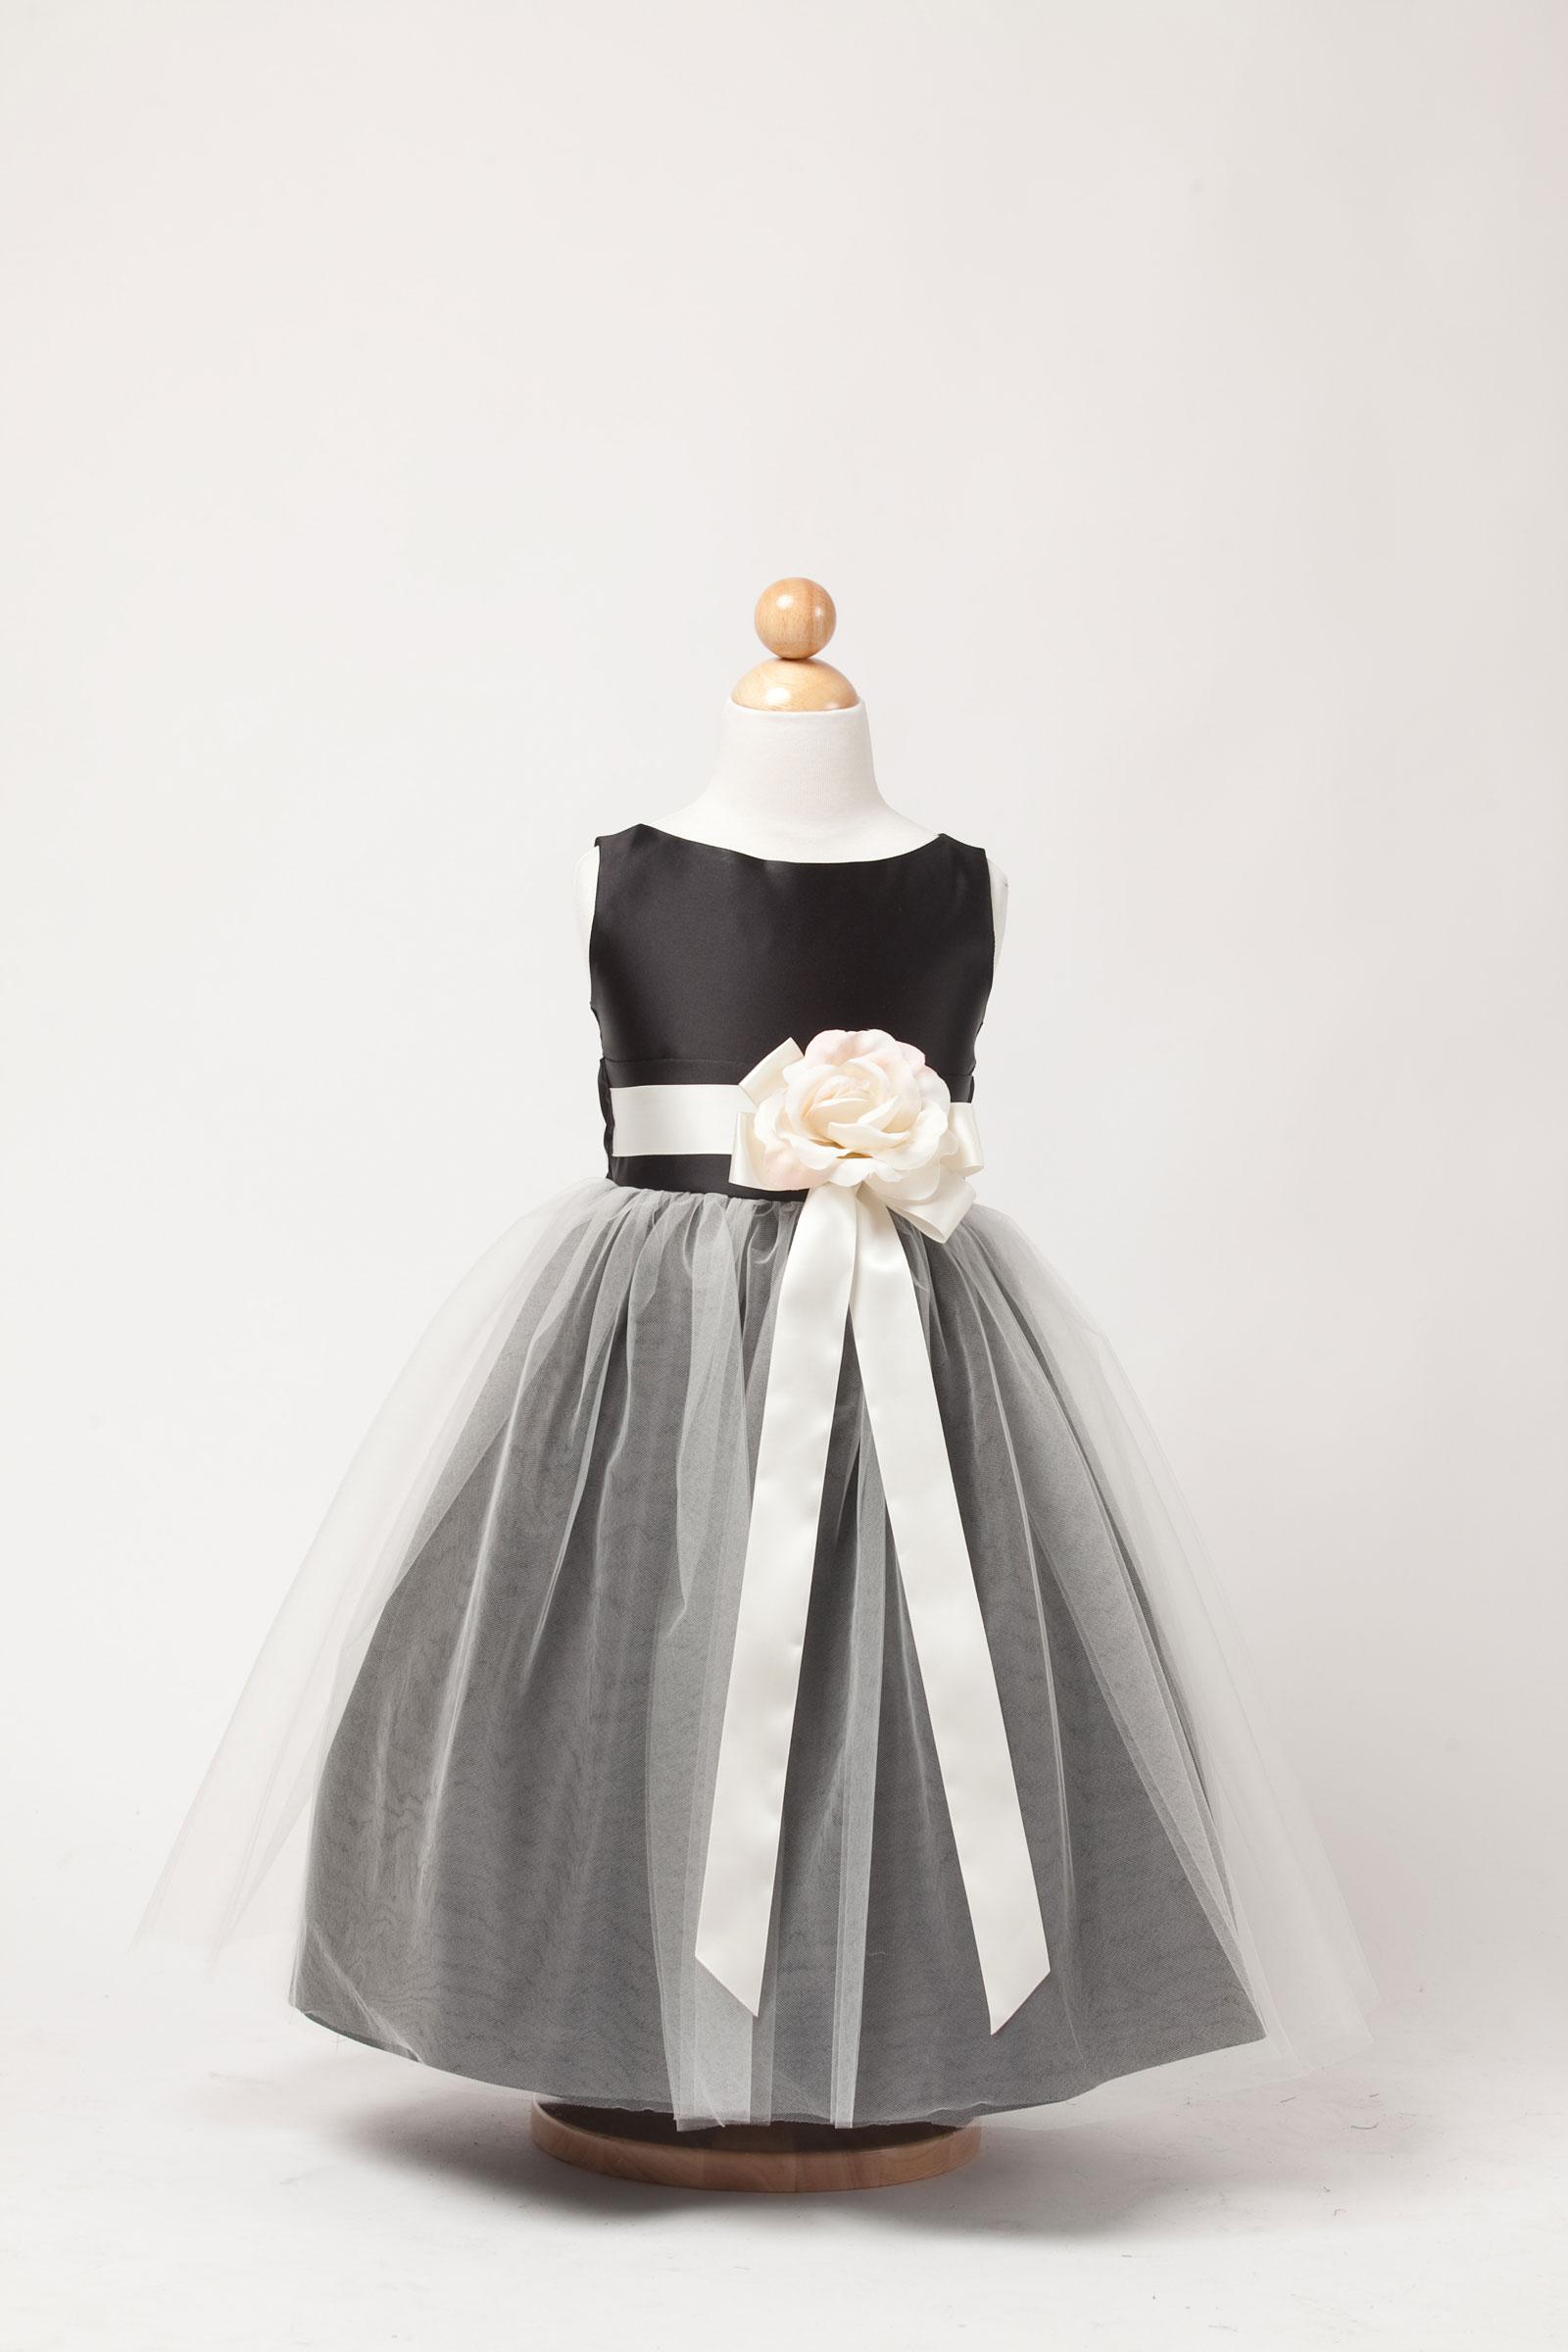 SK 402B Girls Dress Style 402 Sleeveless Satin and Tulle Dress Black F